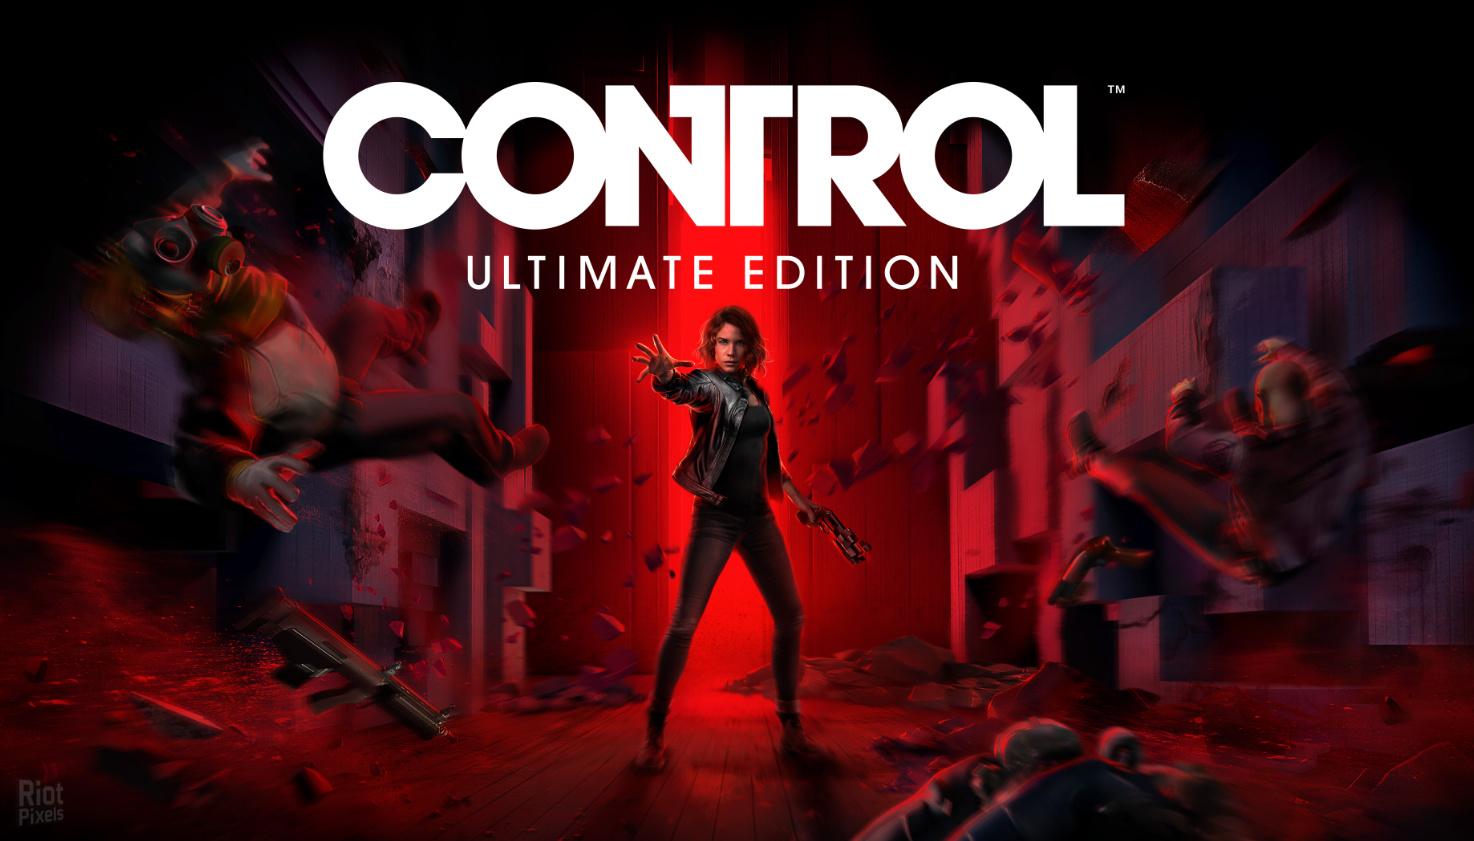 artwork.control-ultimate-edition.1474x841.2020-08-12.12.jpg